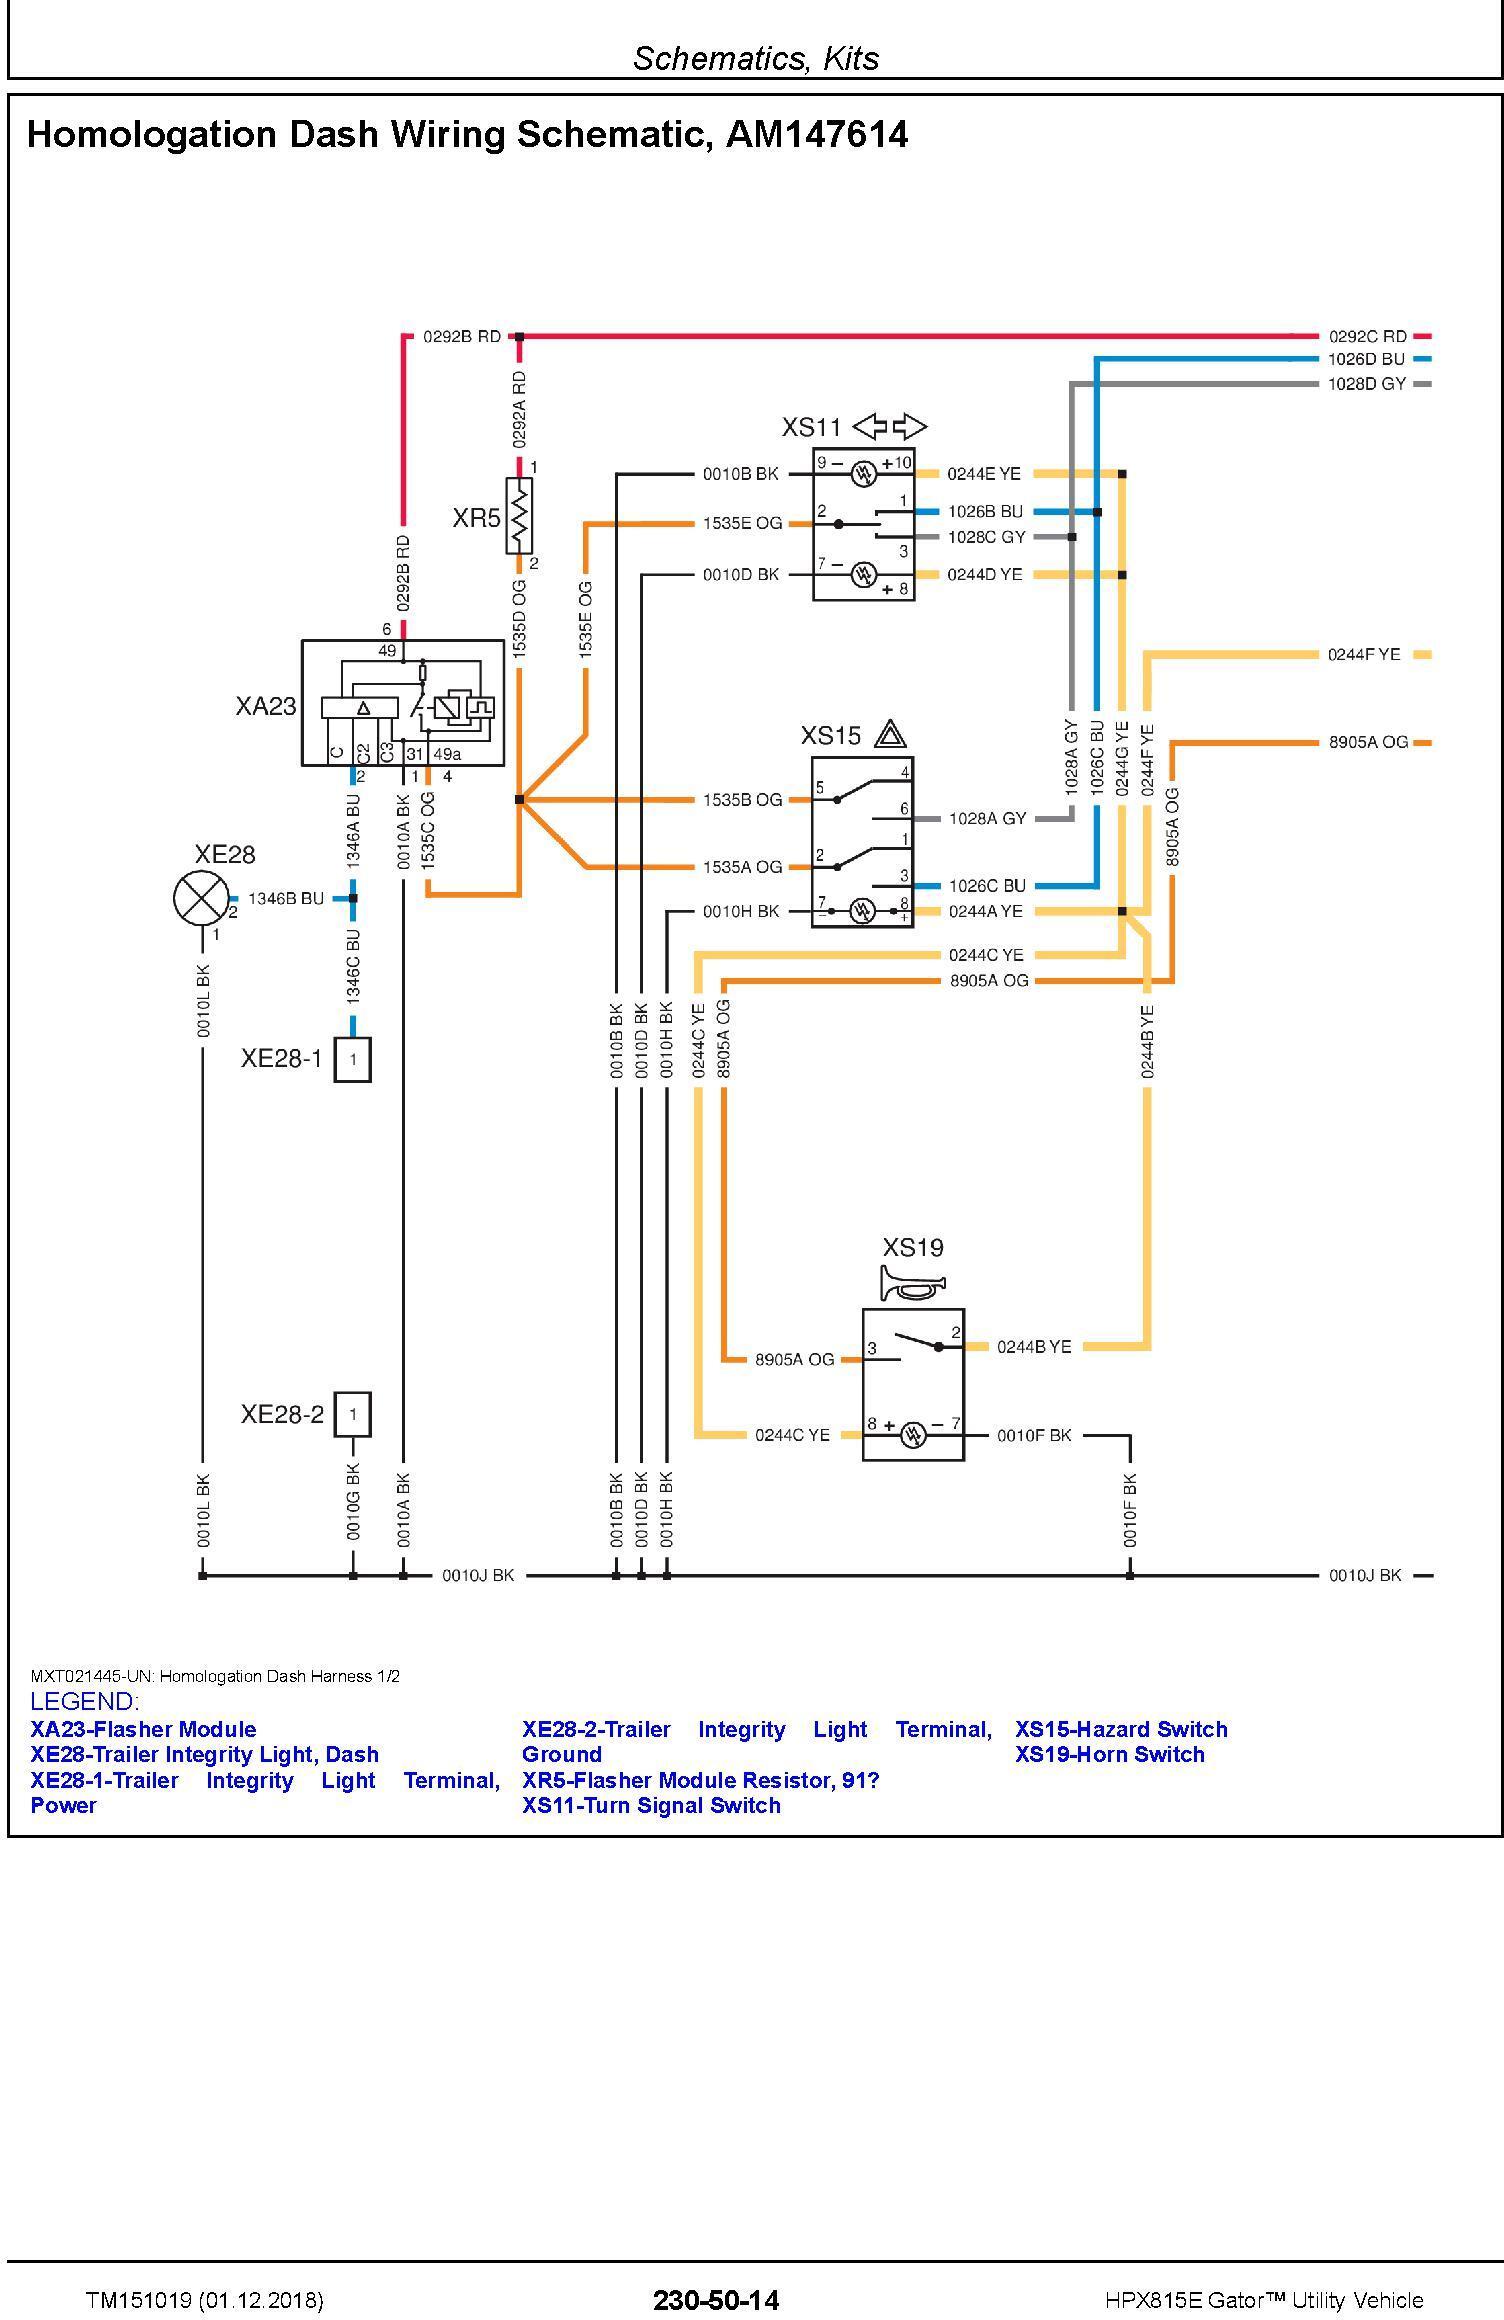 John Deere HPX815E Gator Utility Vehicle (SN. 010001-) Technical Service Manual (TM151019) - 1